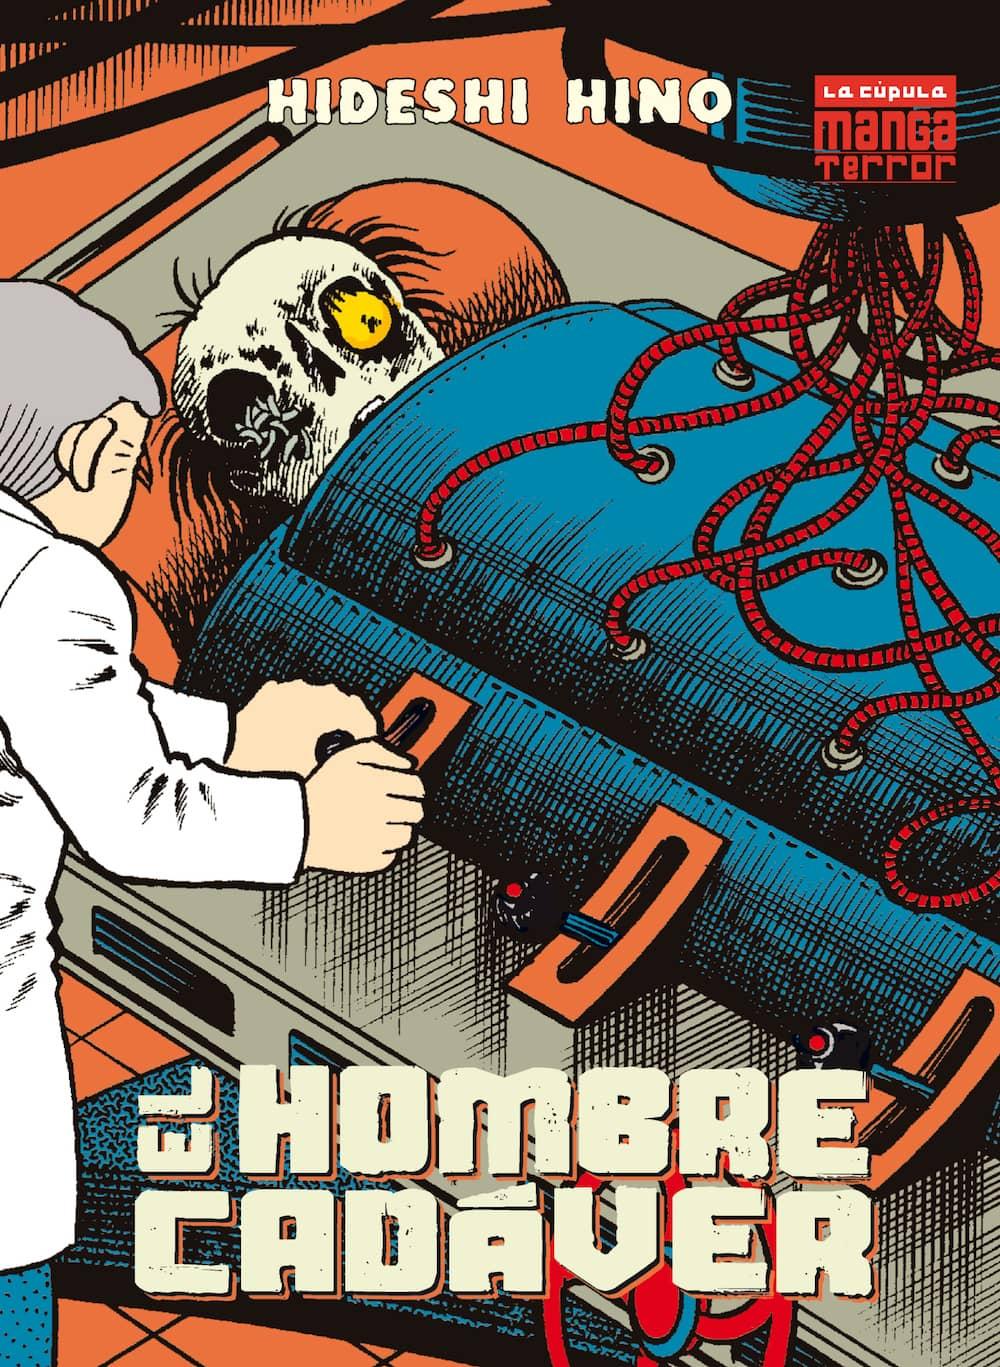 EL HOMBRE CADAVER (2a EDICION)